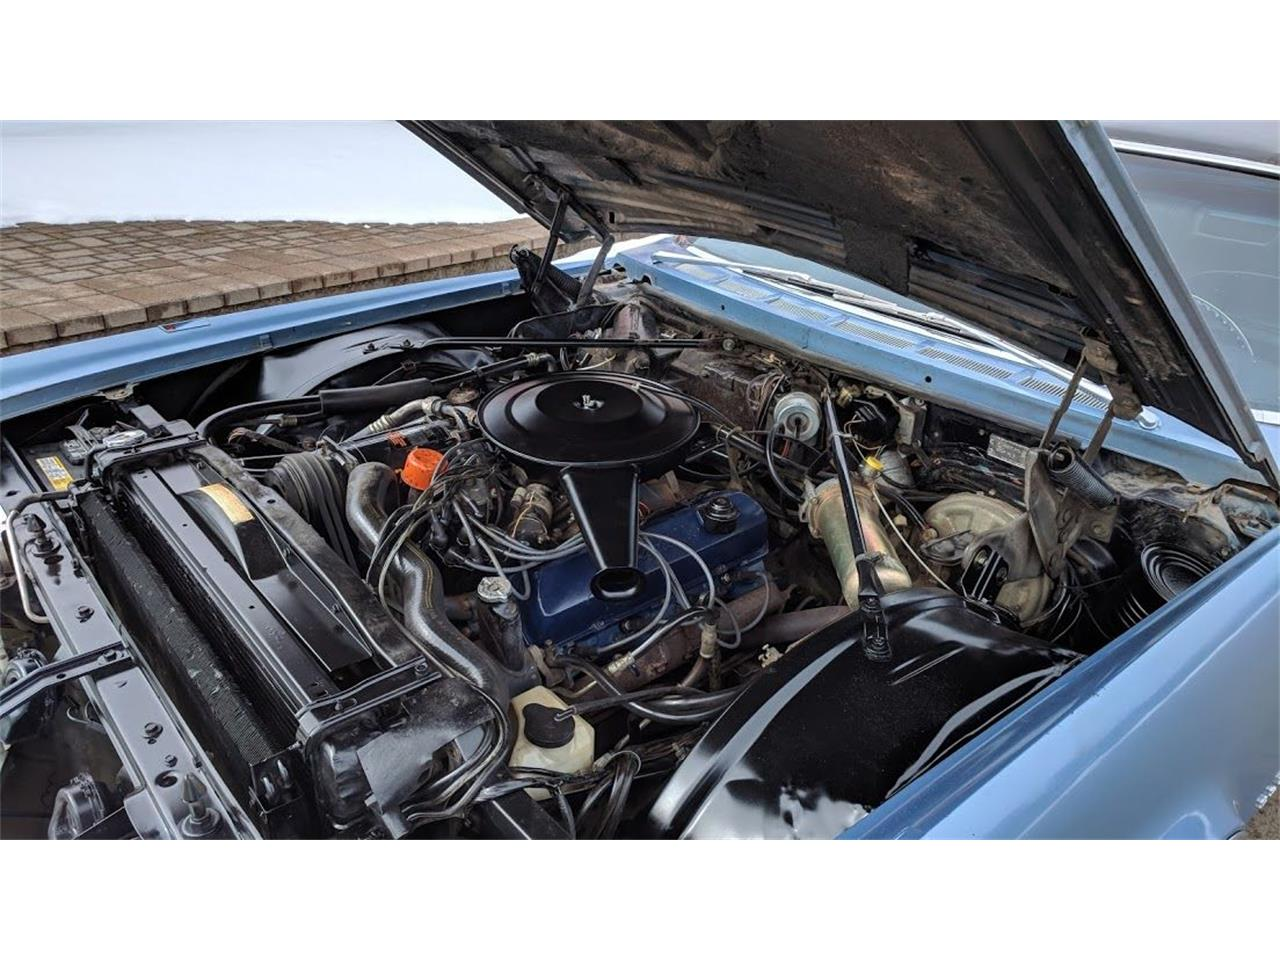 1967 Cadillac Eldorado for sale in Annandale, MN ...